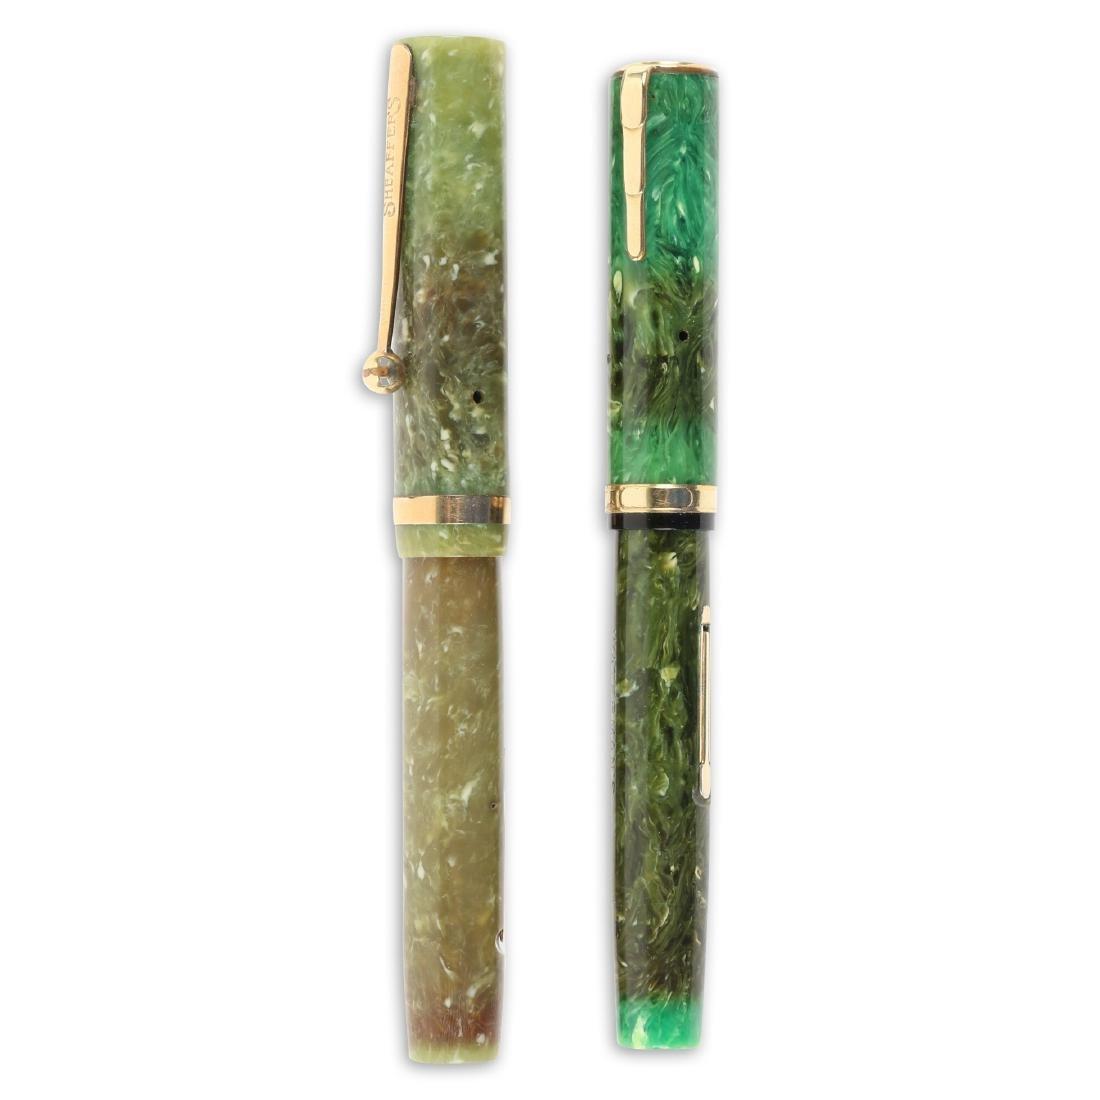 Waterman & Sheaffer Fountain Pens